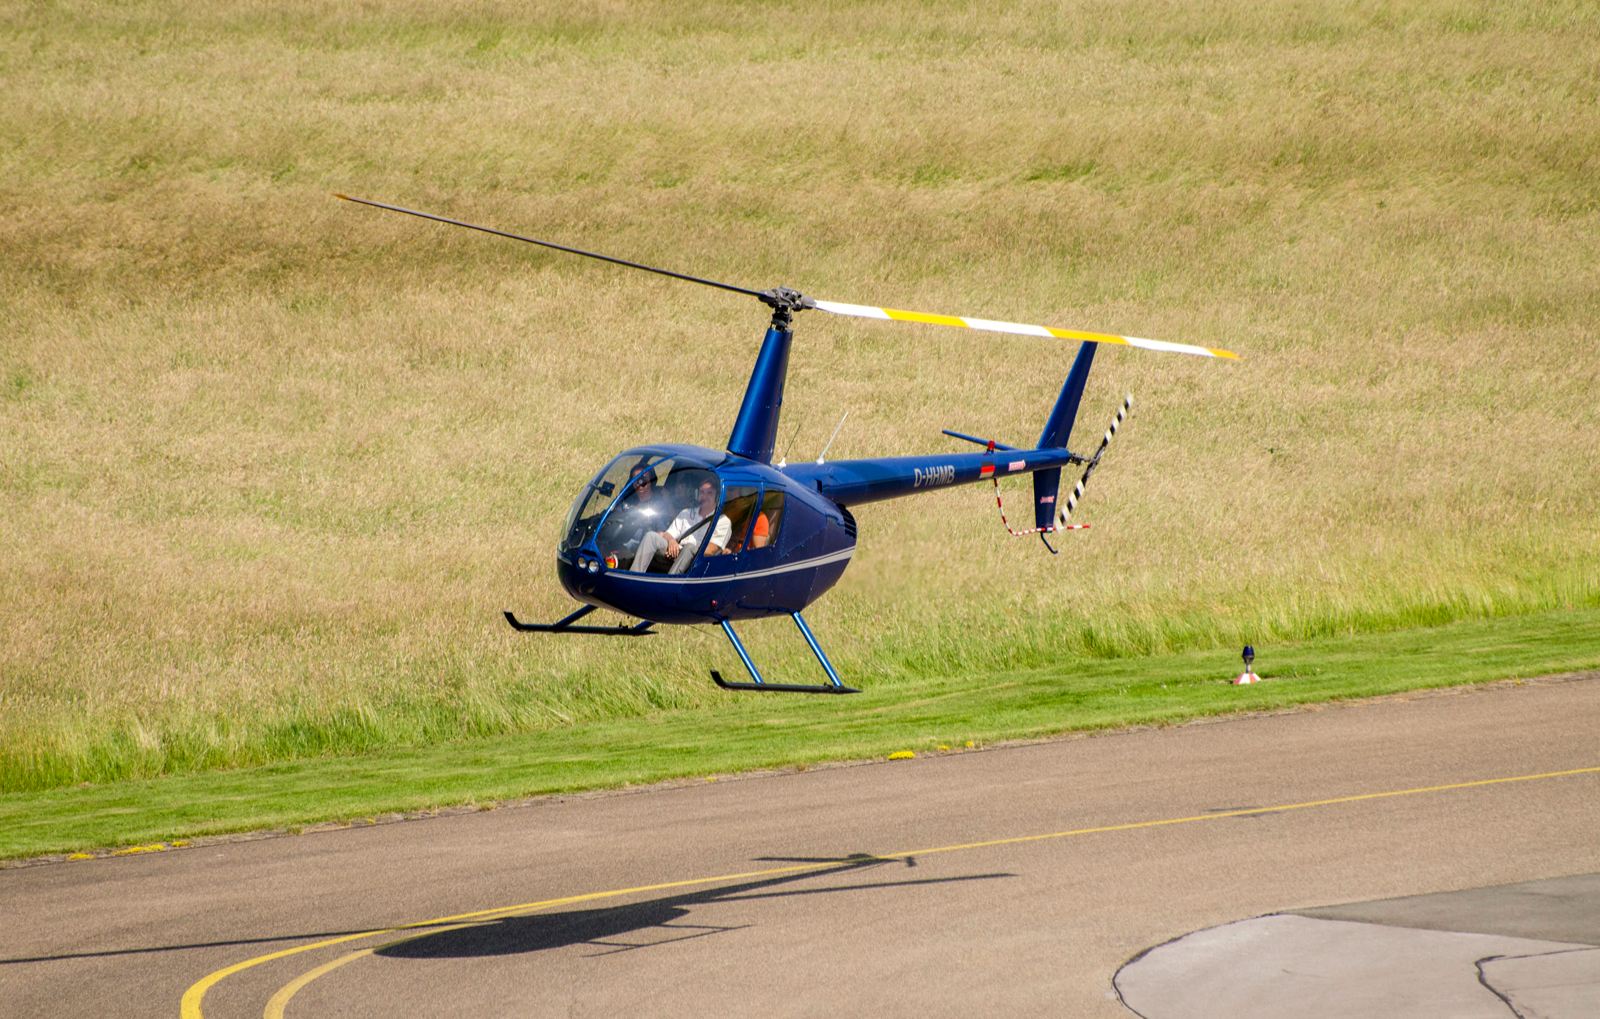 hubschrauber-skyline-flug-sankt-augustin-koeln-bg2